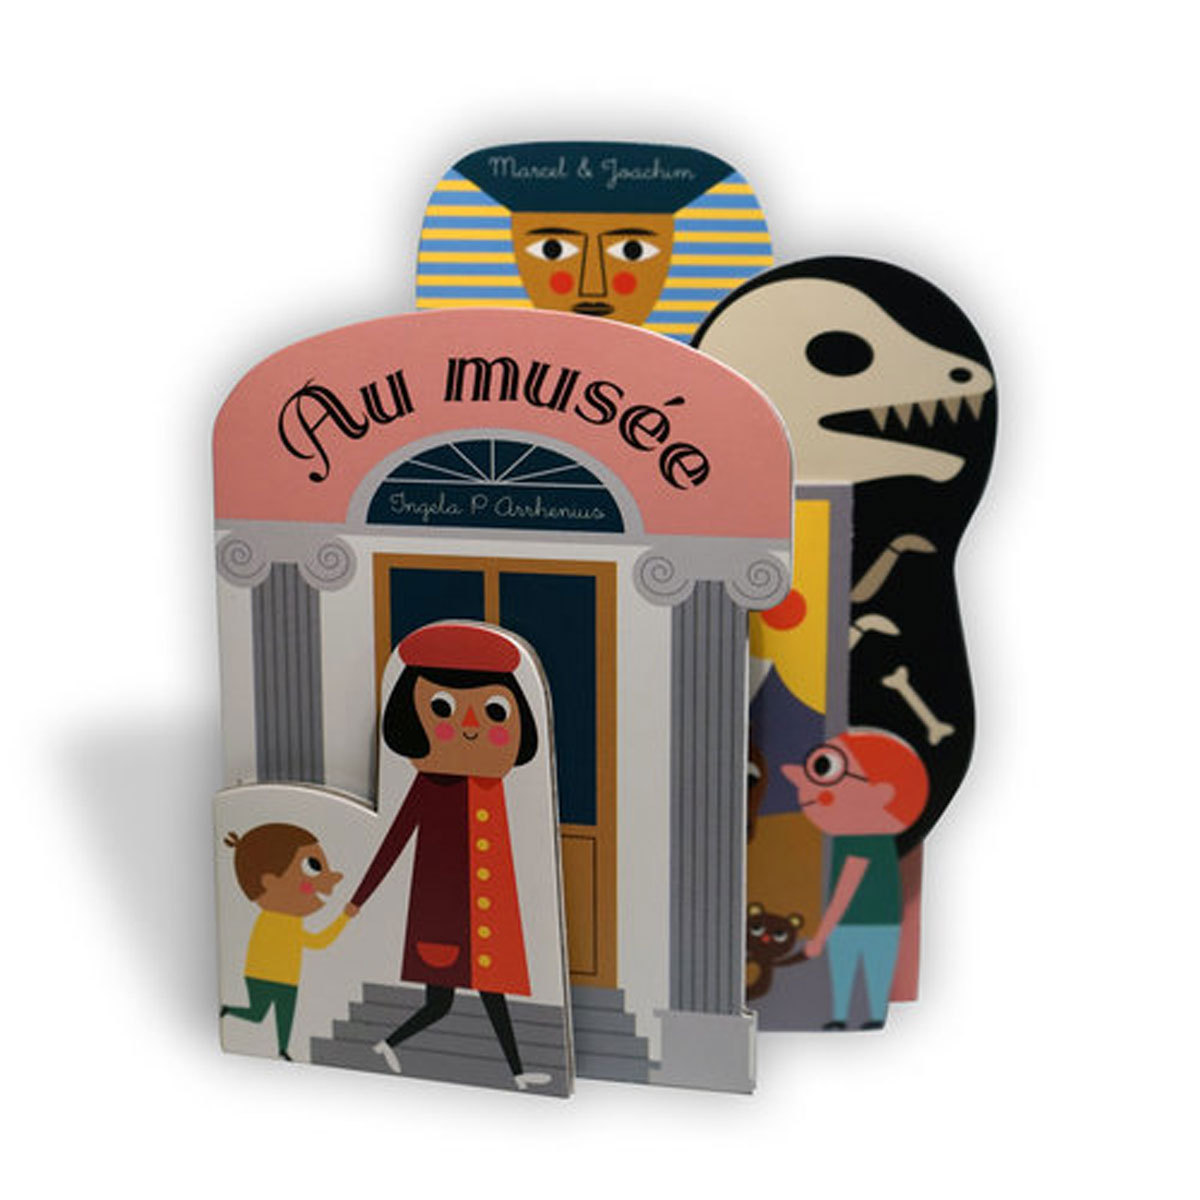 Livre & Carte Au musée Au musée